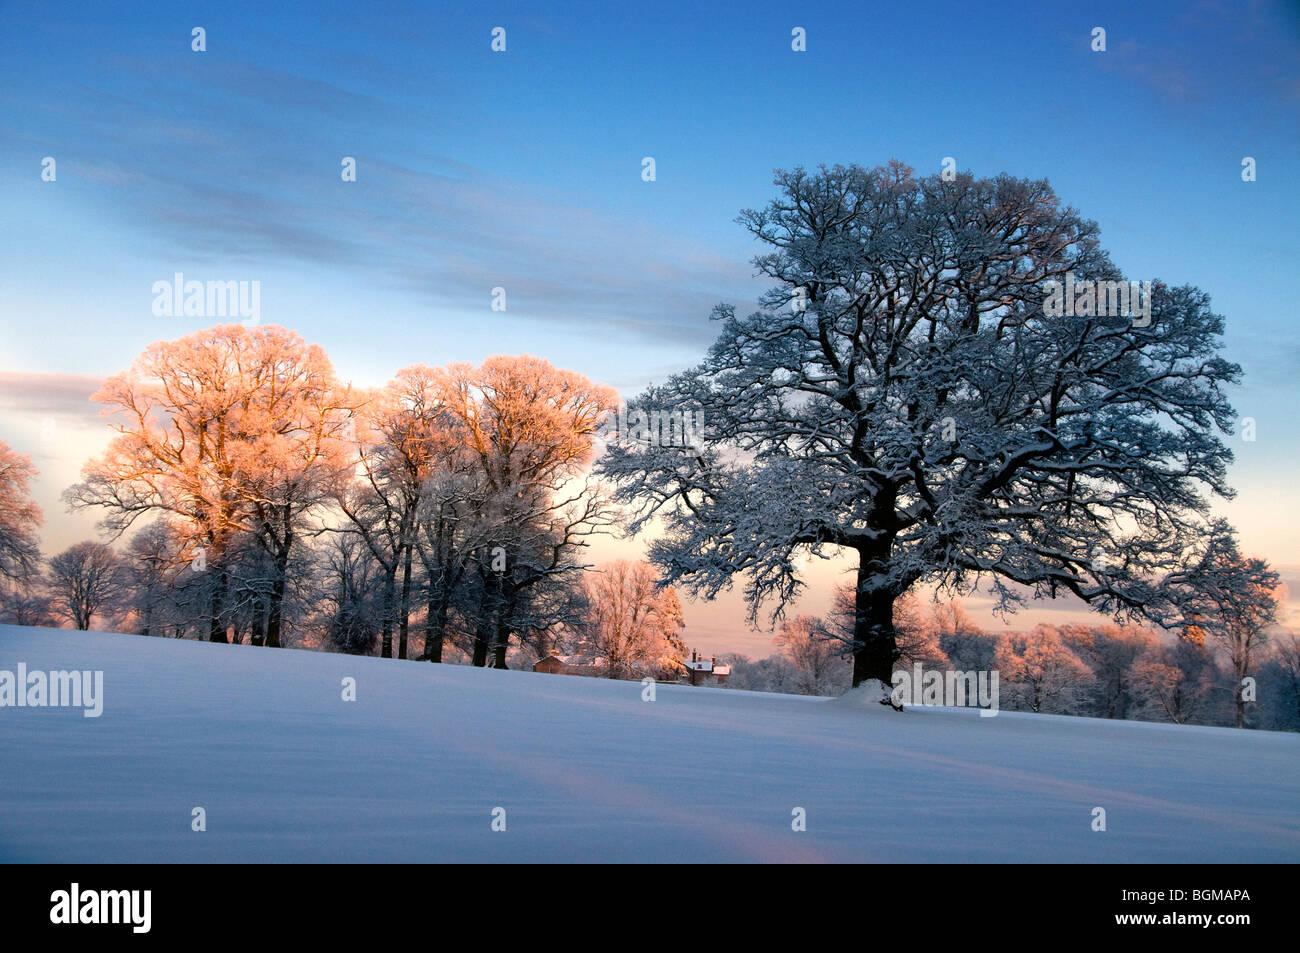 Winter-Wald-Szene Stockfoto